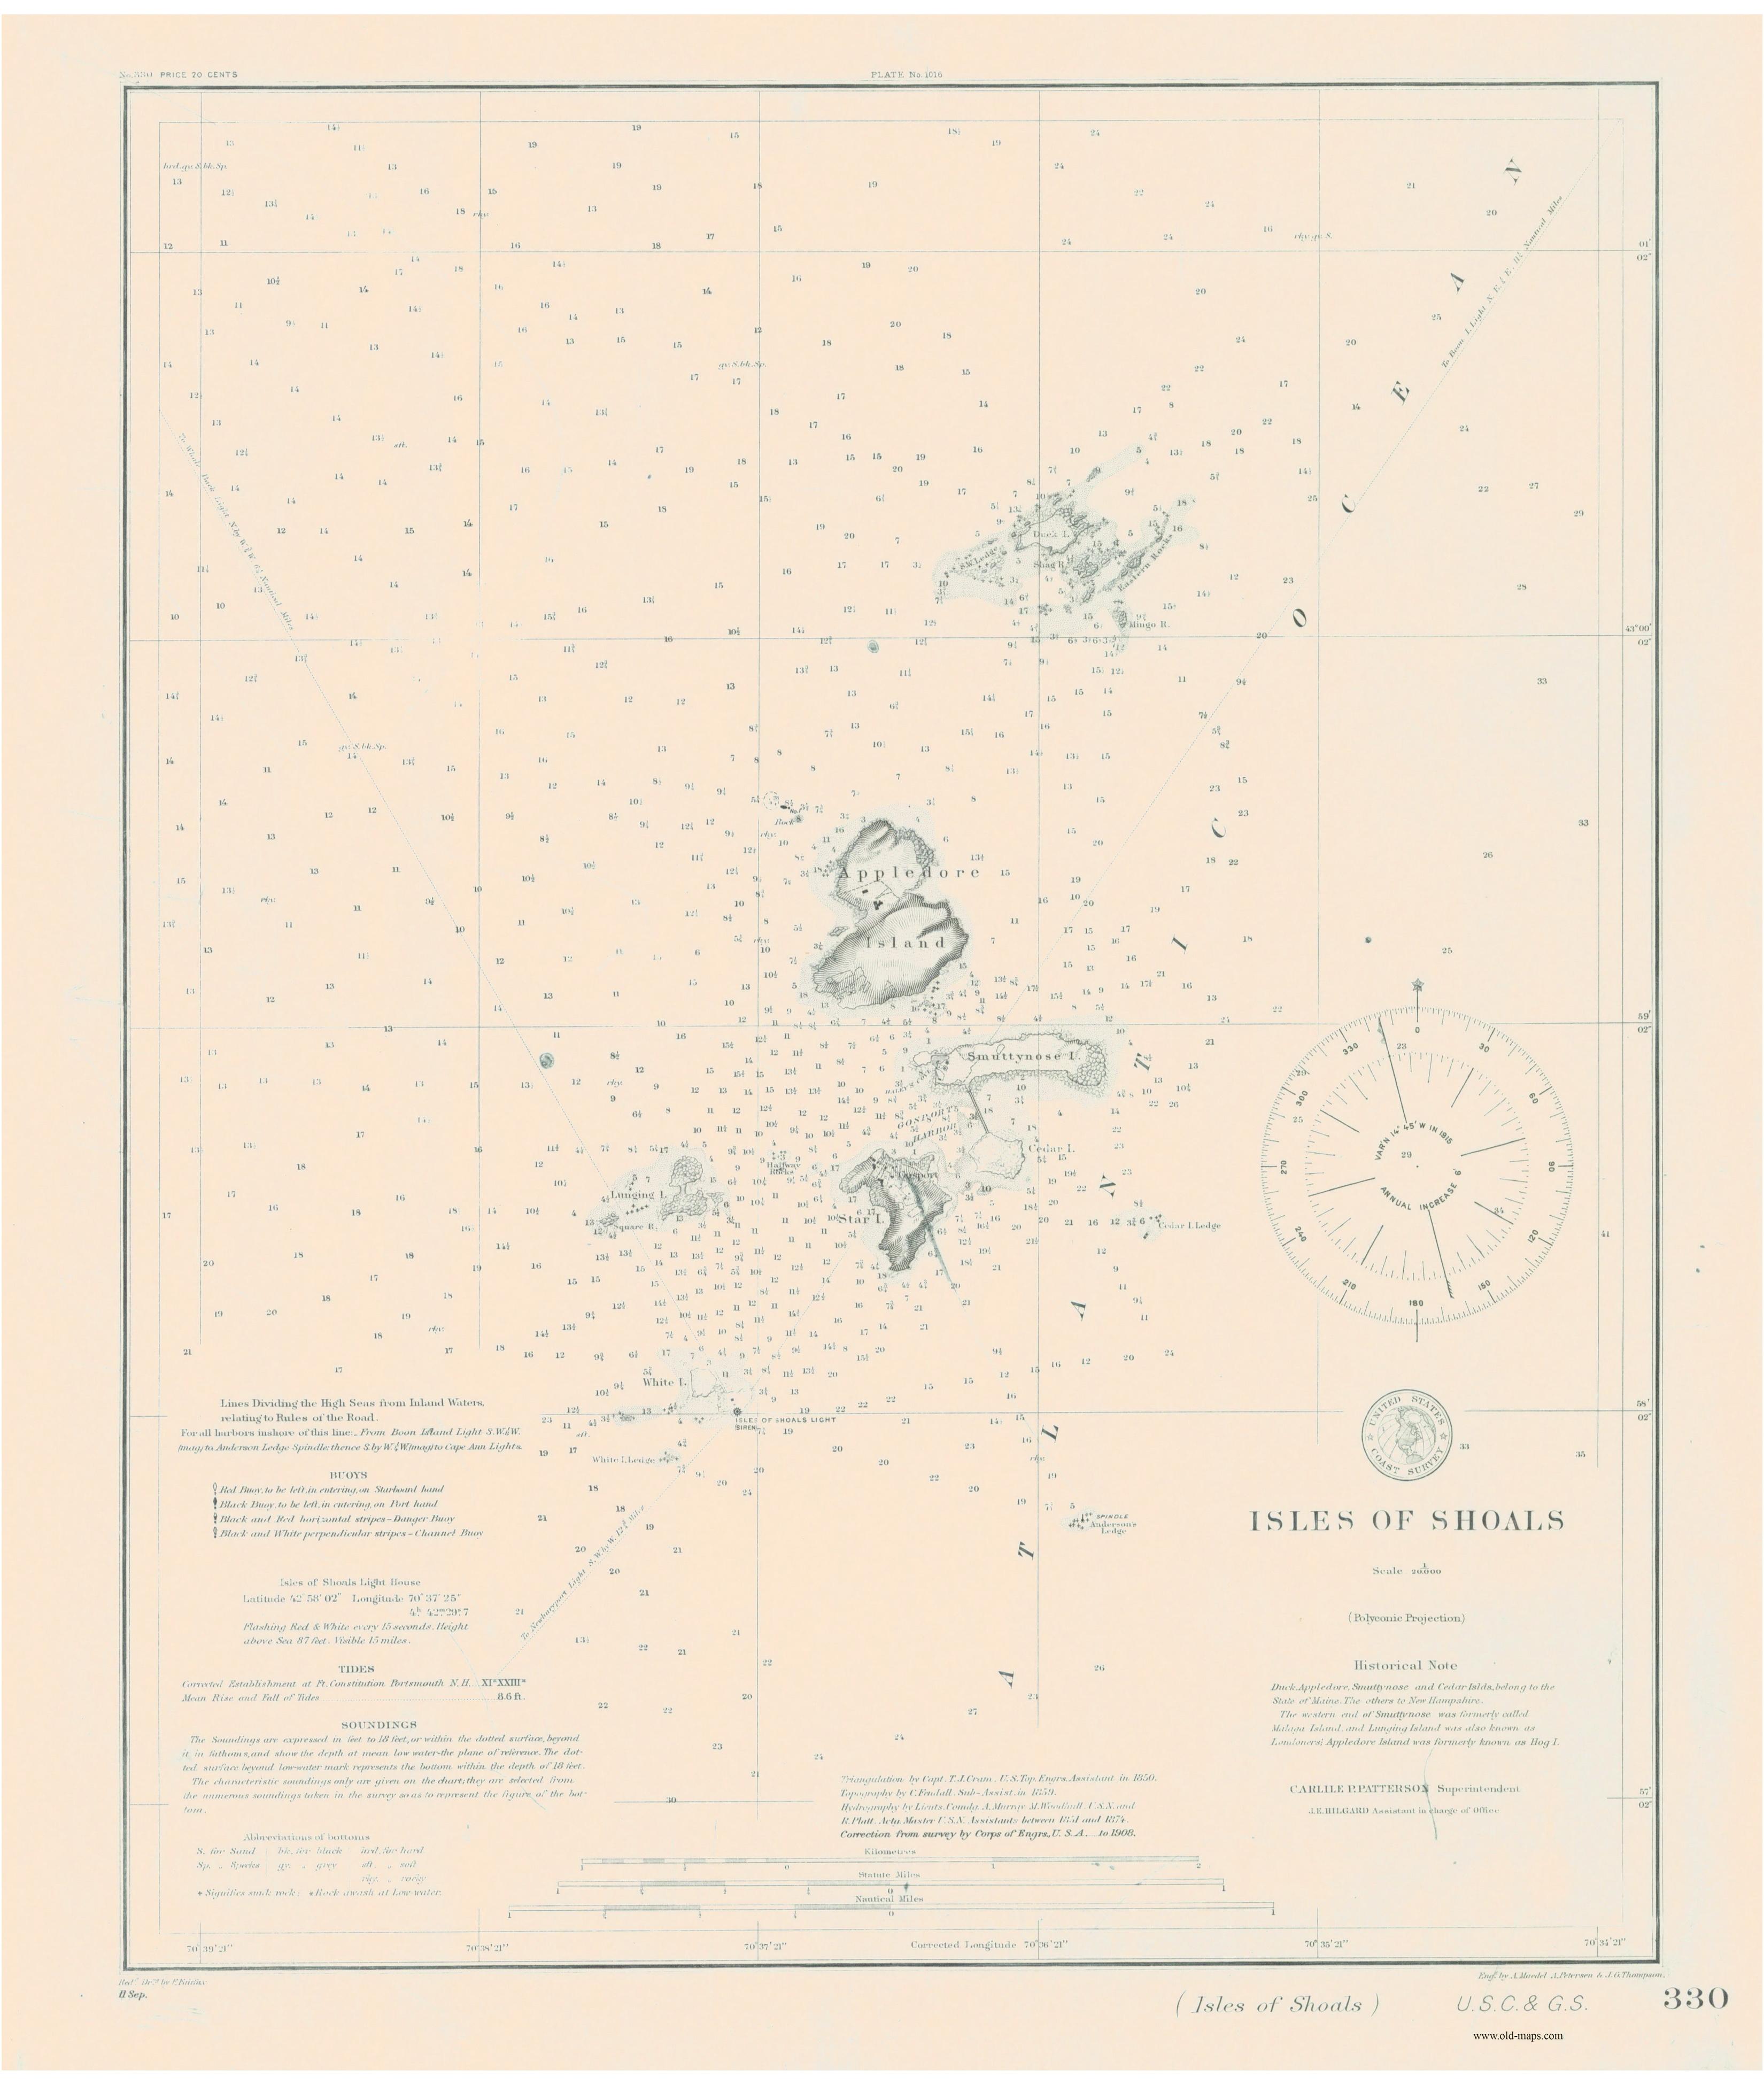 Isle of shoals maine map appledore island maine nubble portsmouth historical nautical charts of maine portsmouth nh to portland on appledore island maine nvjuhfo Image collections